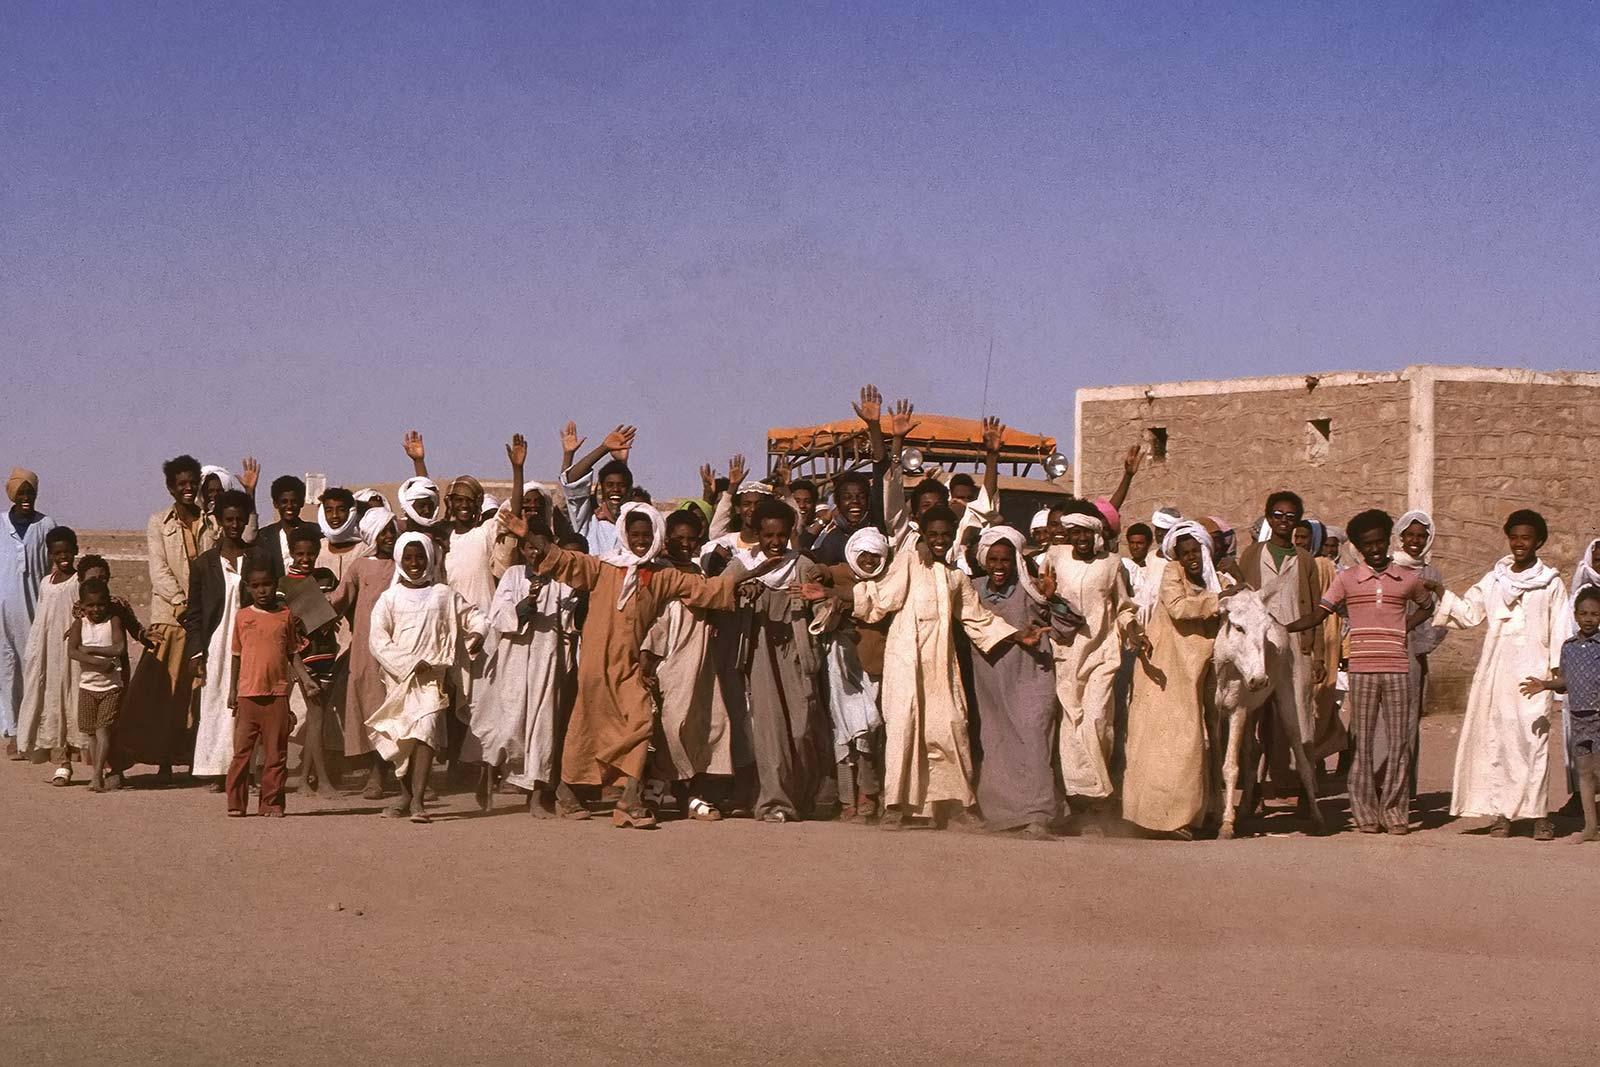 trucking-unimog-dongola-sudan-border-africa